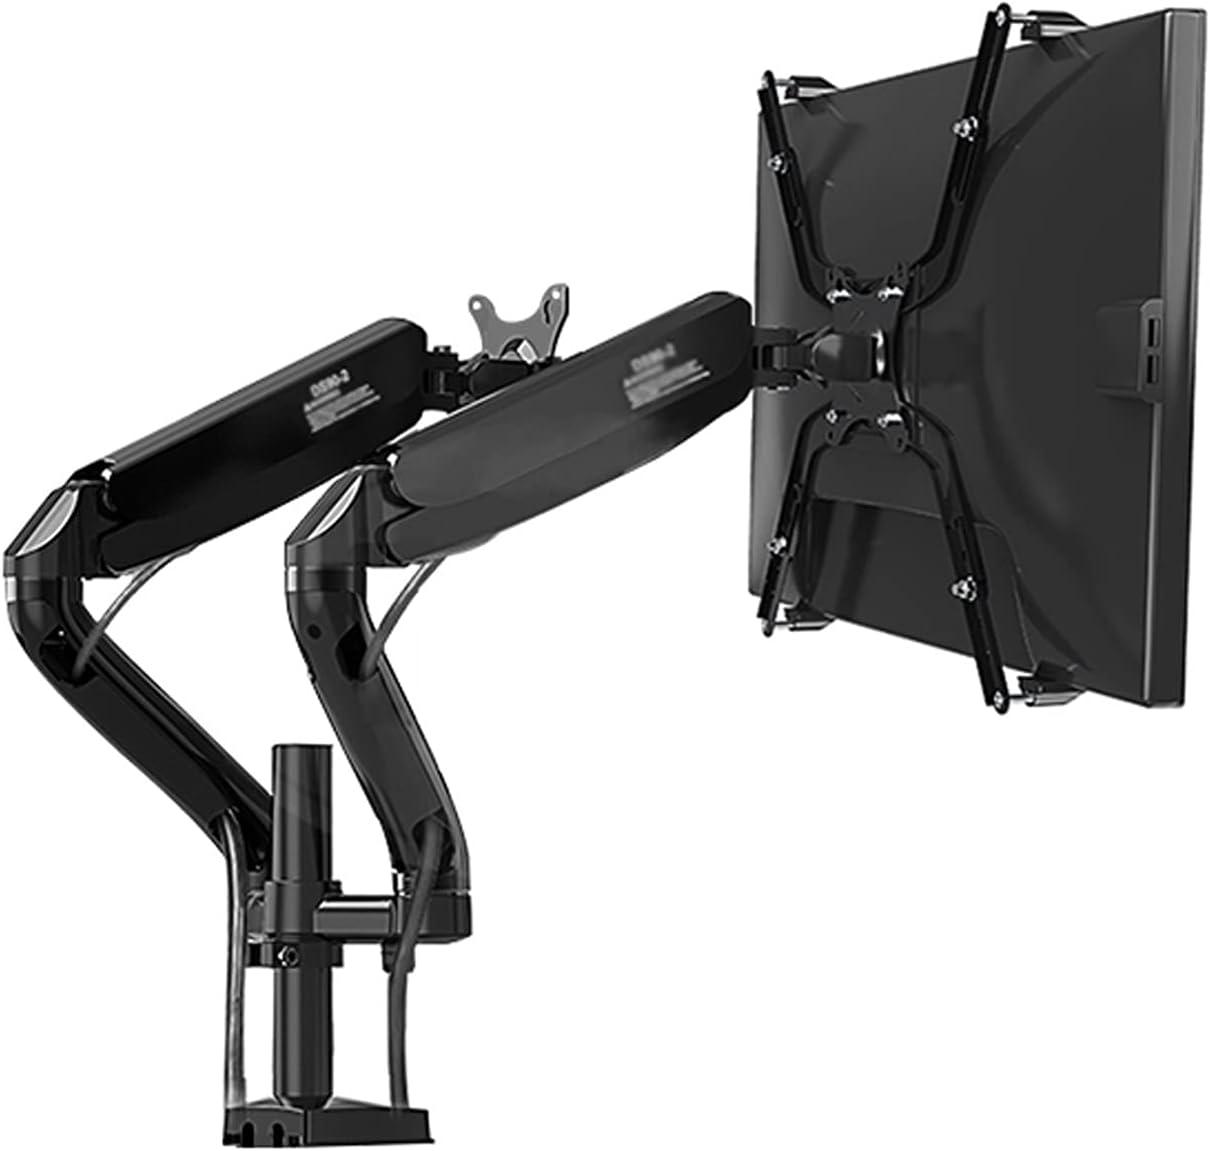 Austin Mall YAOLUU Monitor Max 54% OFF Arms Stands Sta Mount Desk Dual